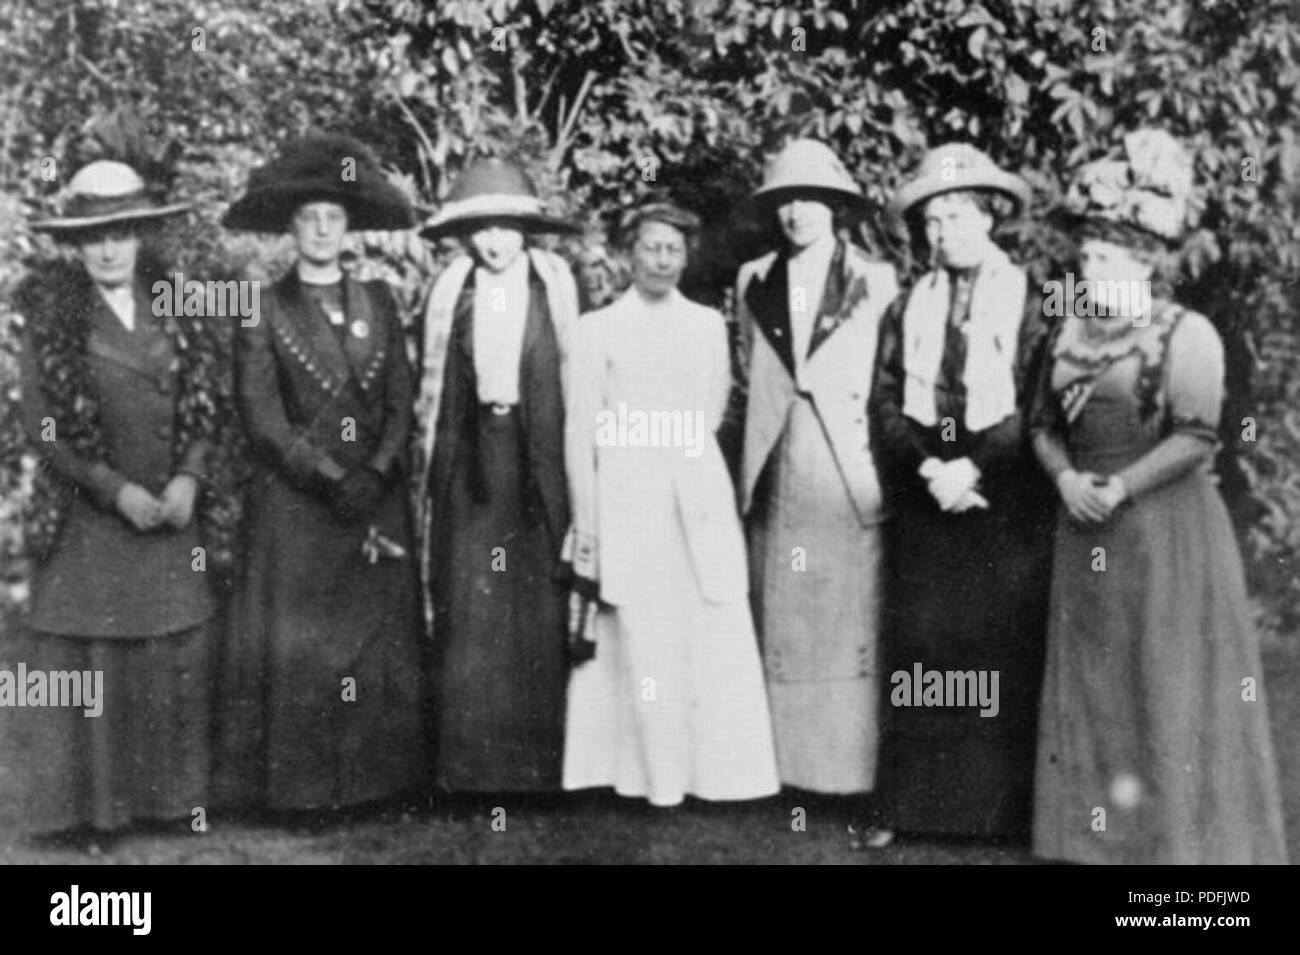 151 Helen Crawfurd, Janet Barrowman, Margaret McPhun, Mrs A.A. Wilson, Frances McPhun, Nancy A. John and Annie Swan Stock Photo